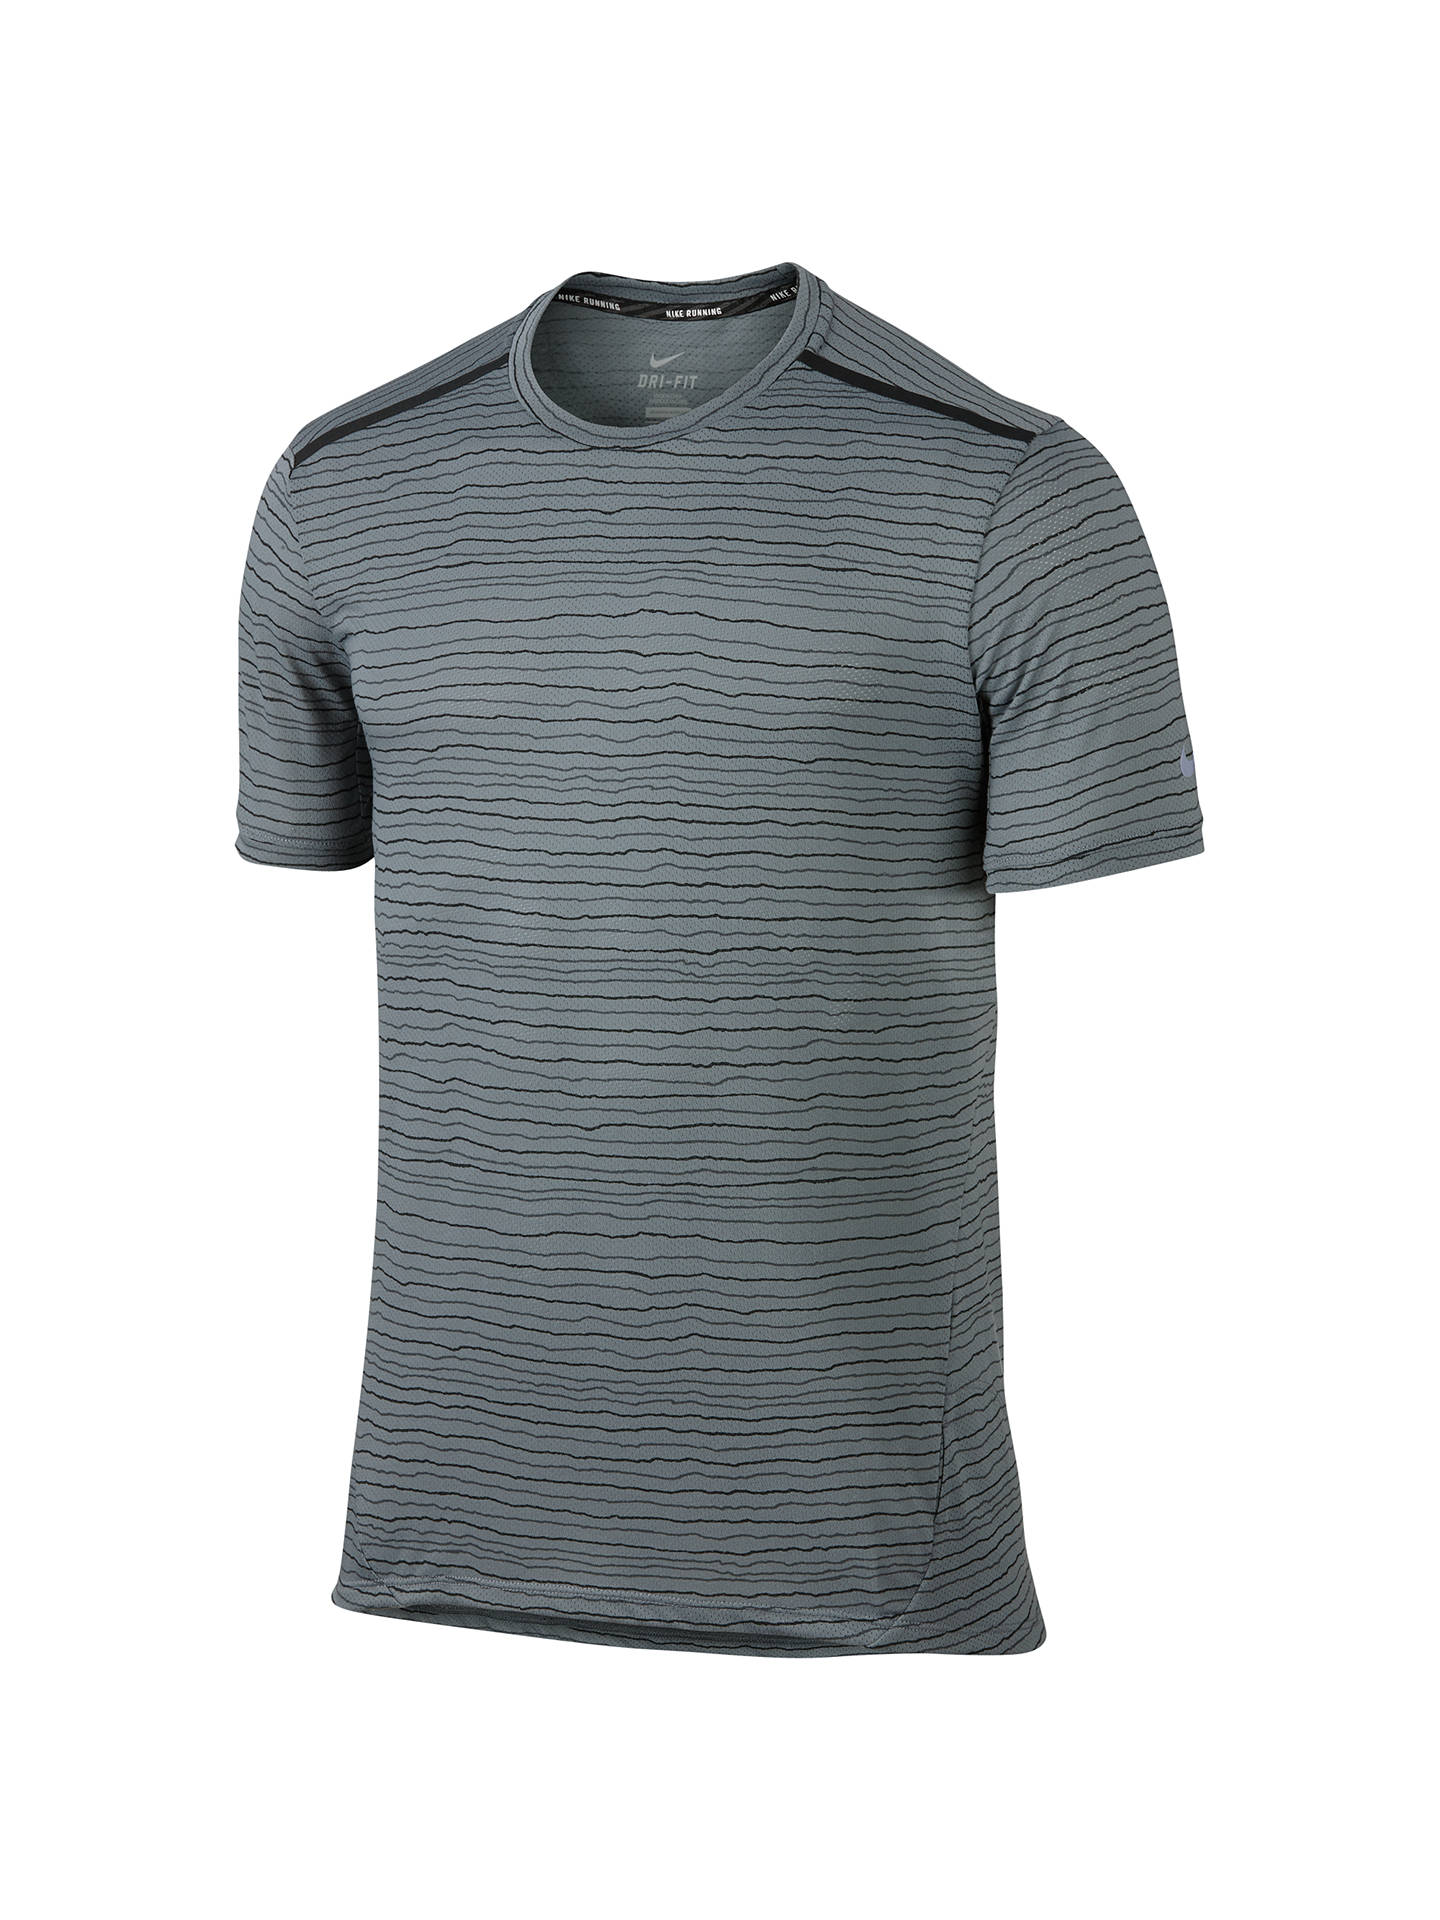 80459a25 Buy Nike Dri-FIT Cool Tailwind Stripe T-Shirt, Cool Grey/Reflective ...